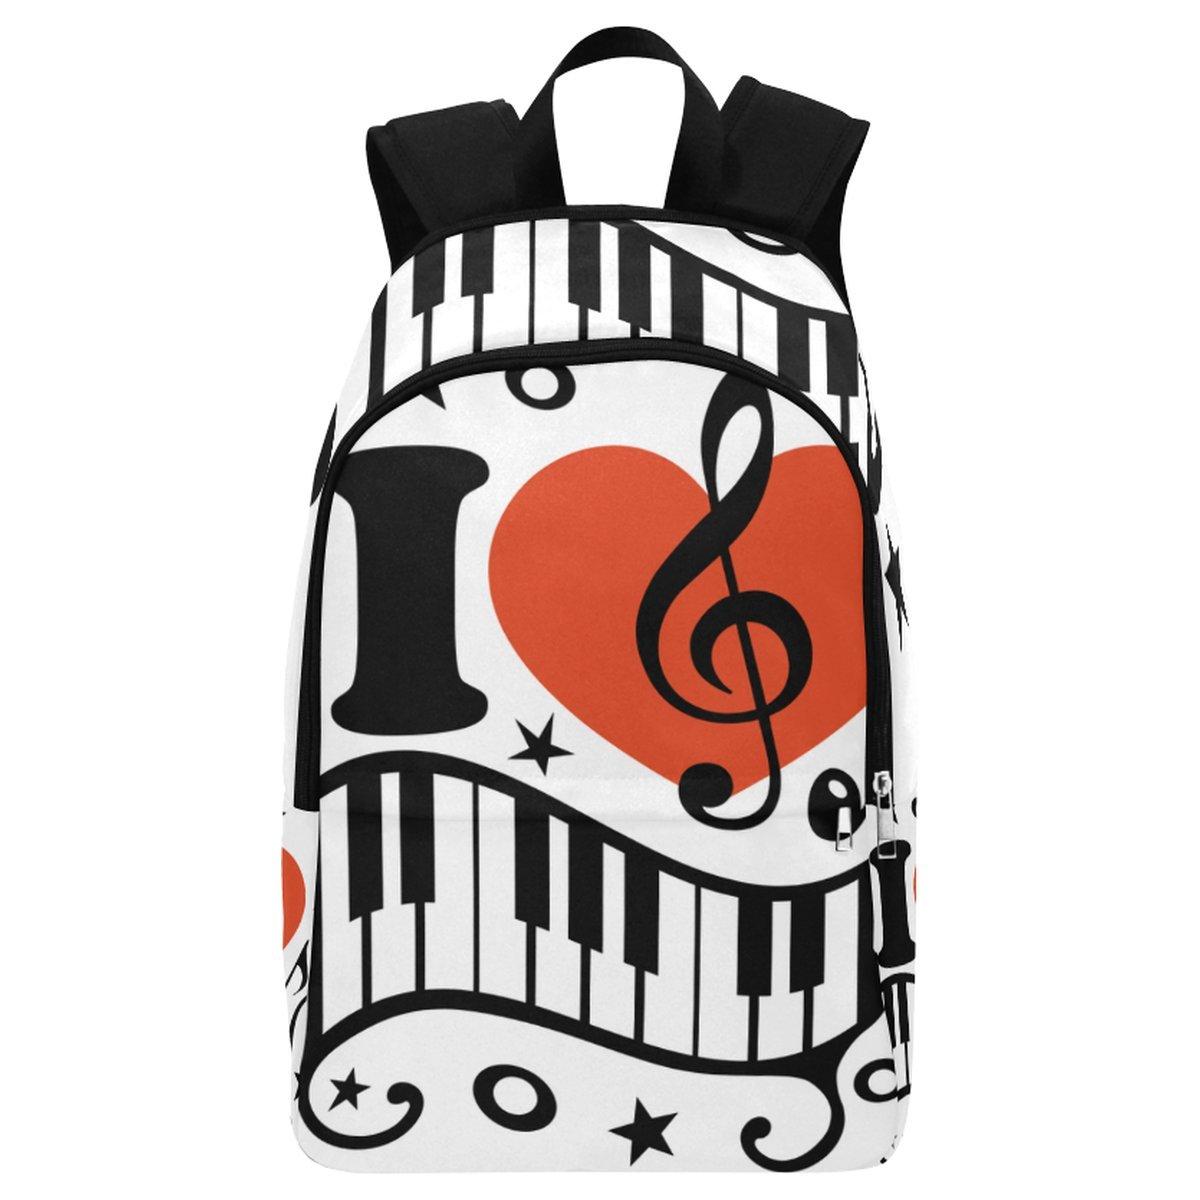 InterestPrint Custom Love Heart Music Note Piano Casual Backpack School Bag Travel Daypack